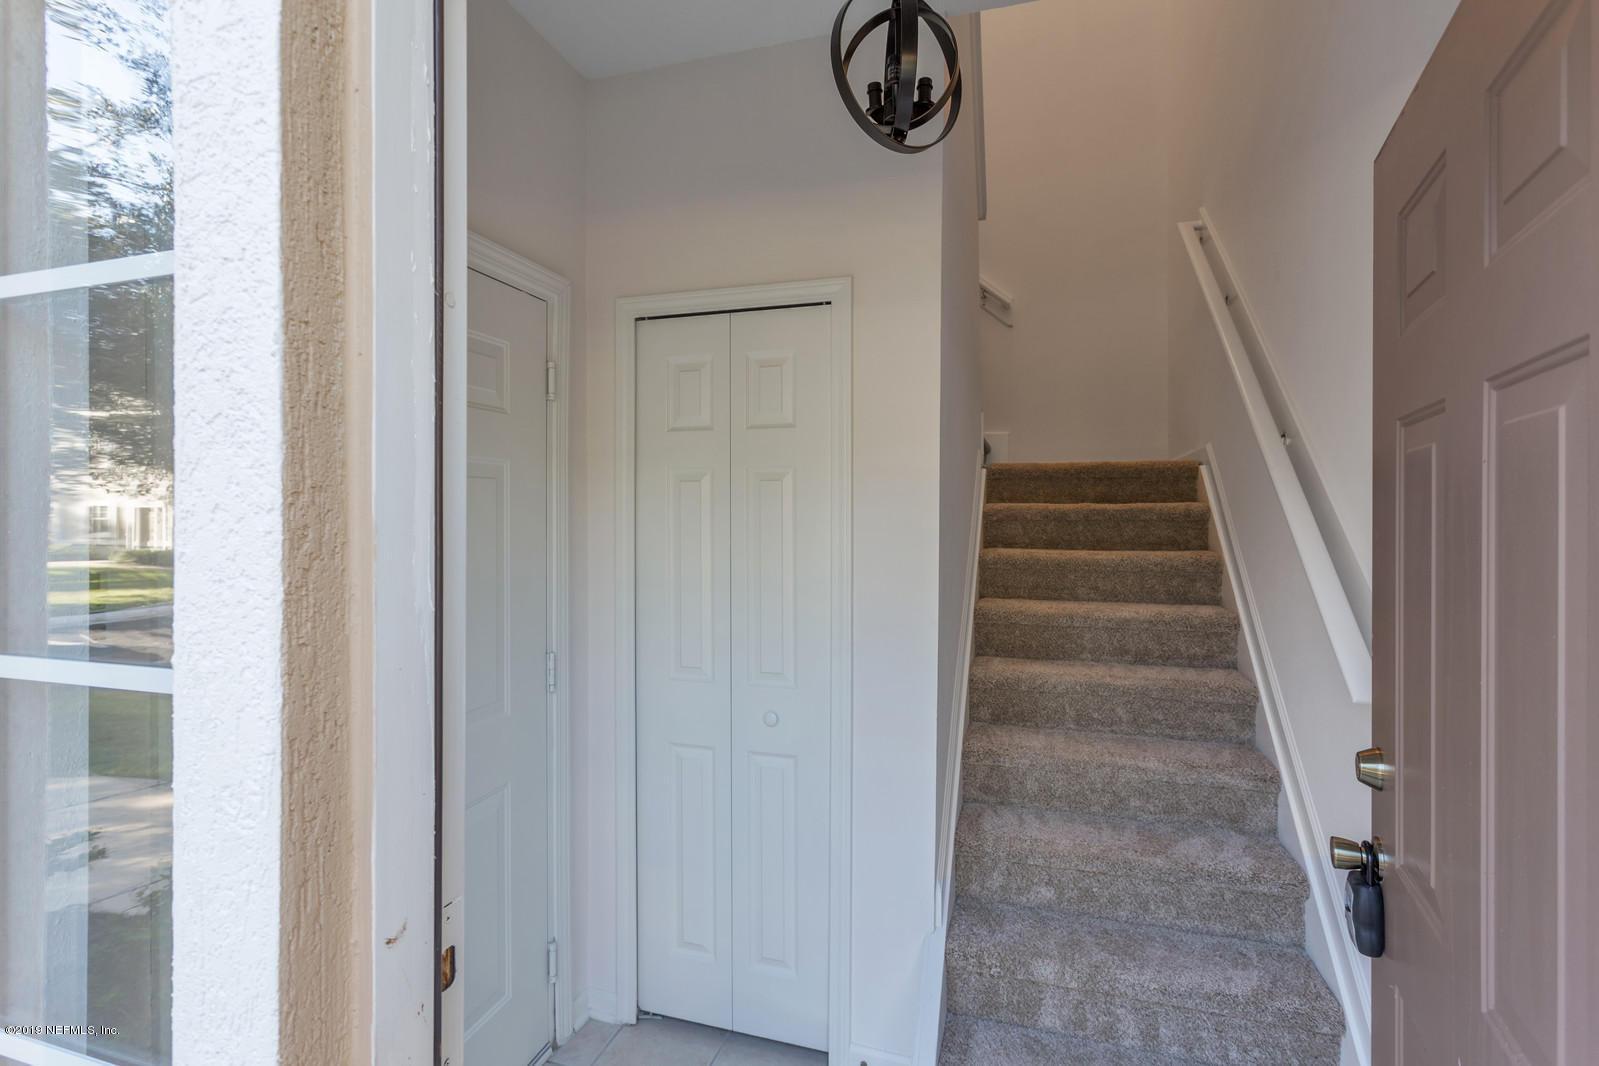 1731 FOREST LAKE, JACKSONVILLE, FLORIDA 32225, 2 Bedrooms Bedrooms, ,2 BathroomsBathrooms,Condo,For sale,FOREST LAKE,1019354